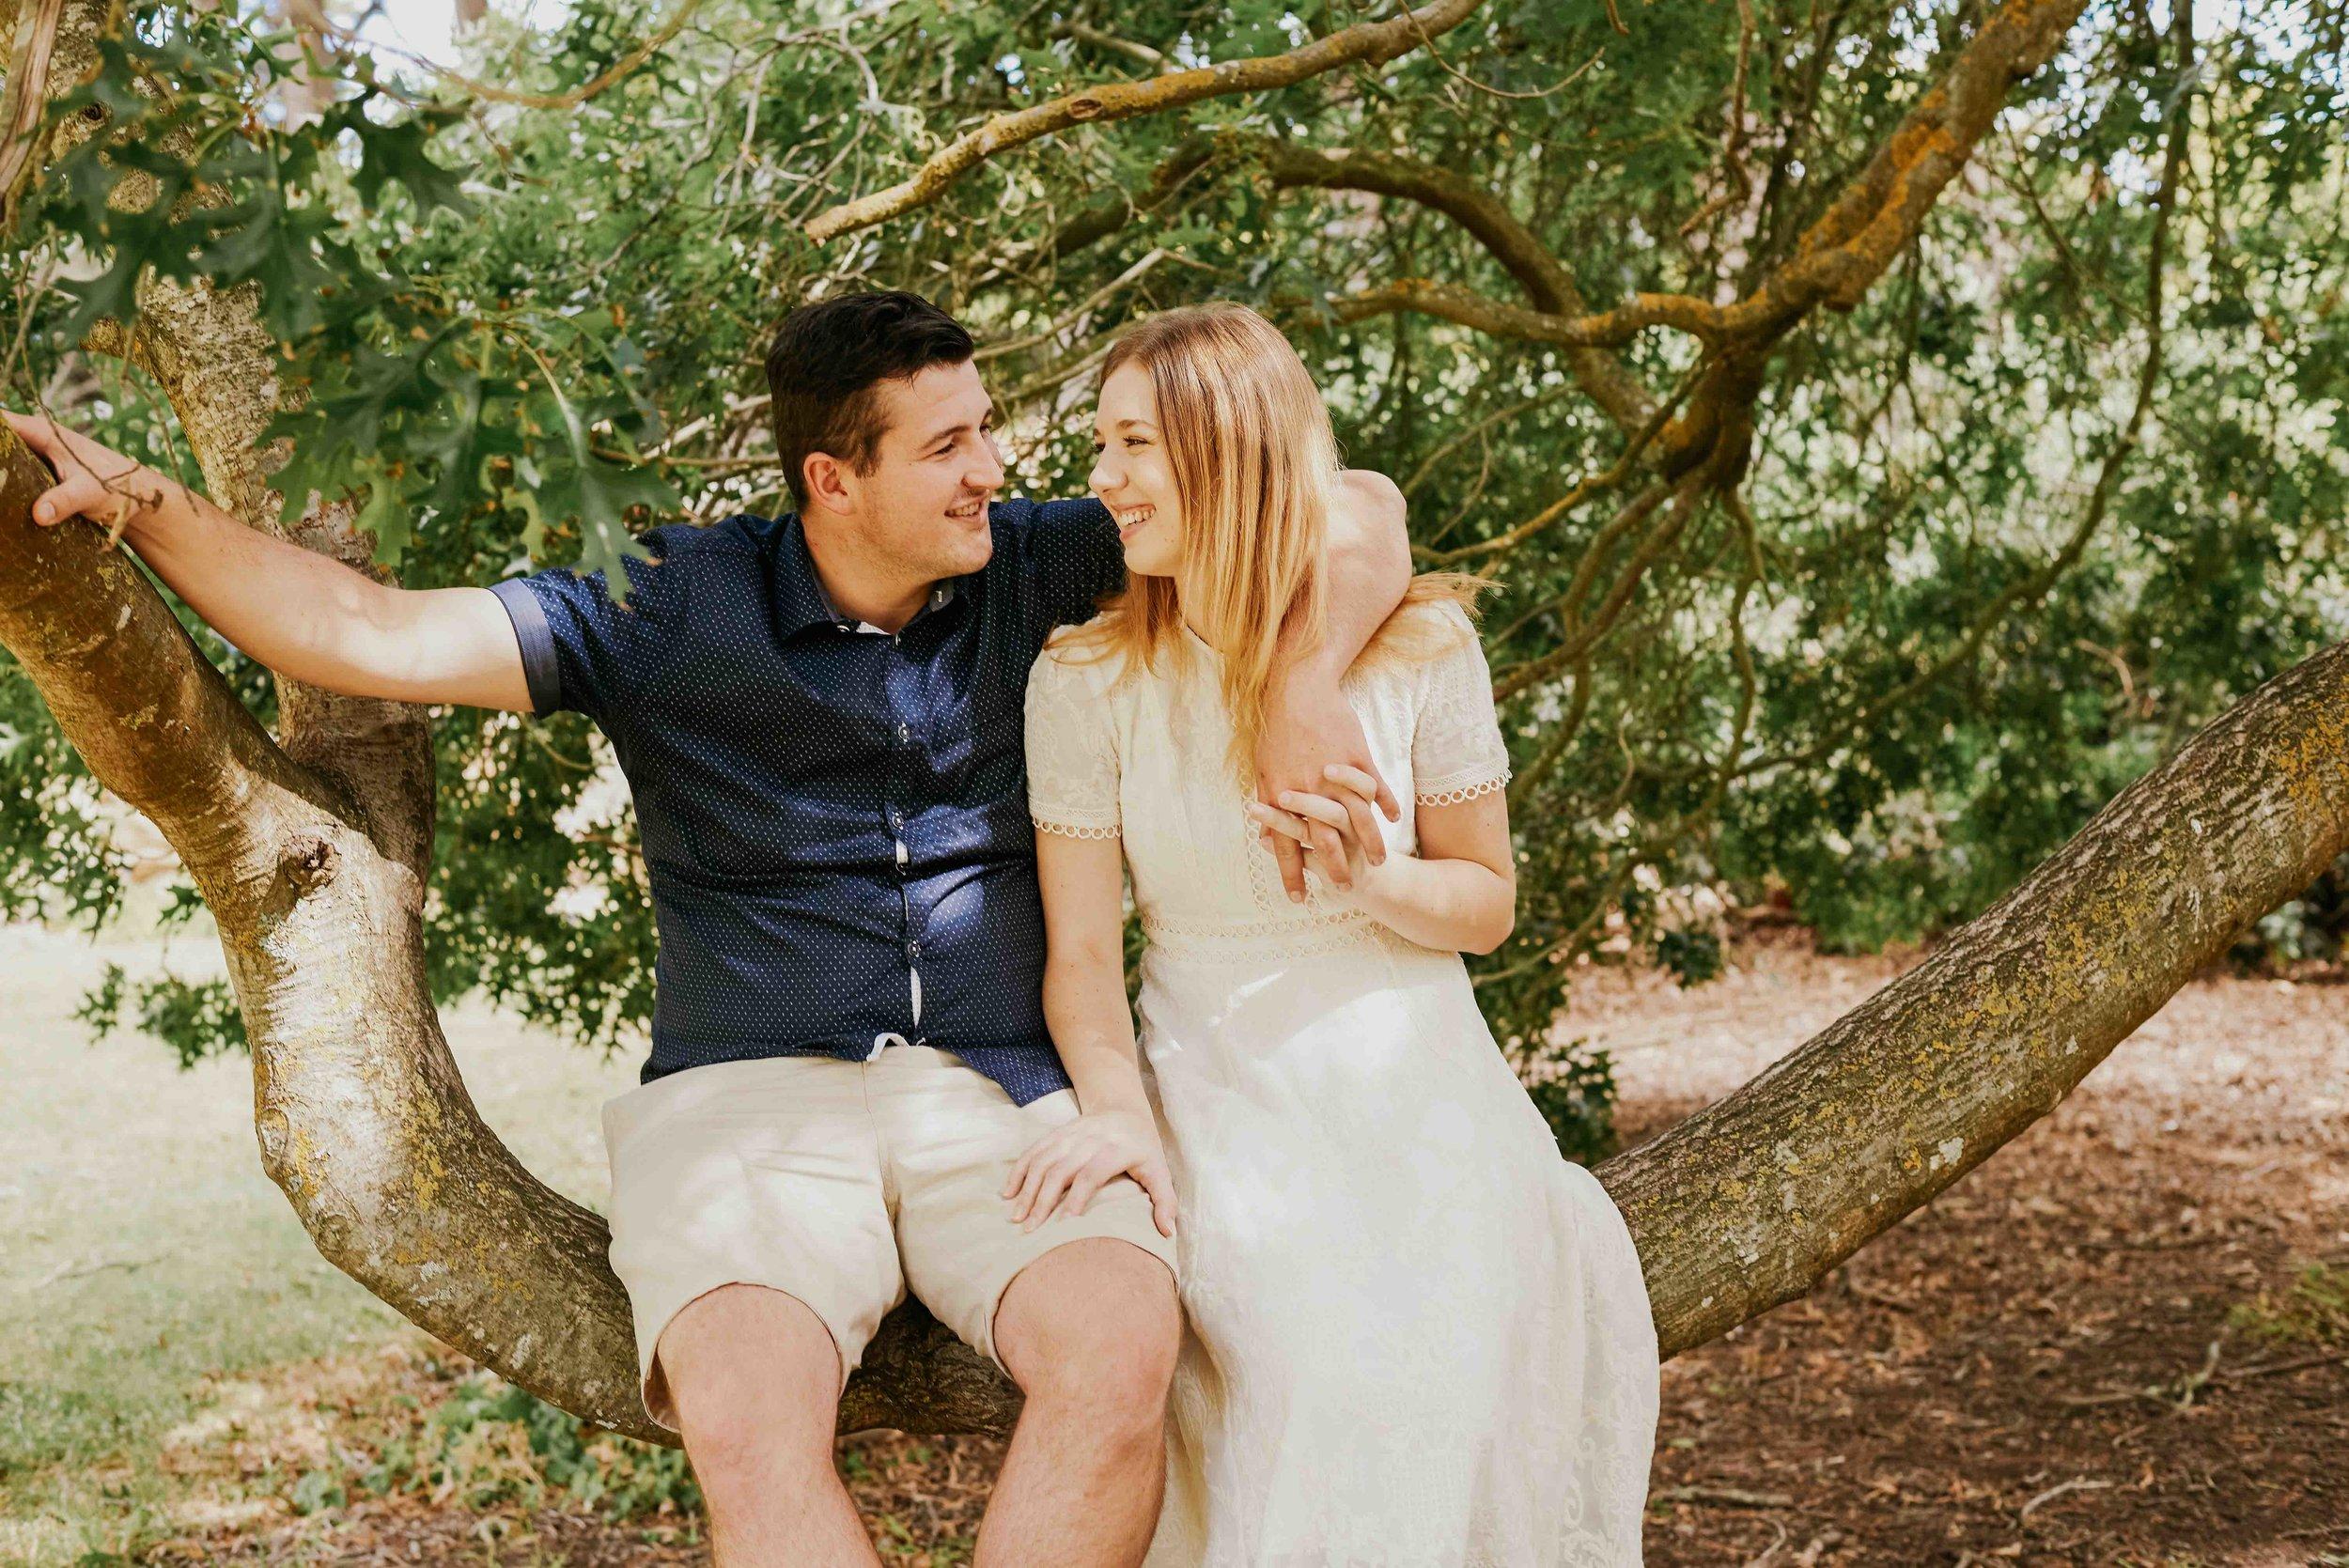 marissa-jade-photography-mornington-peninsula-wedding-photographer-natural-engagement-photography-red-hill-57.jpg